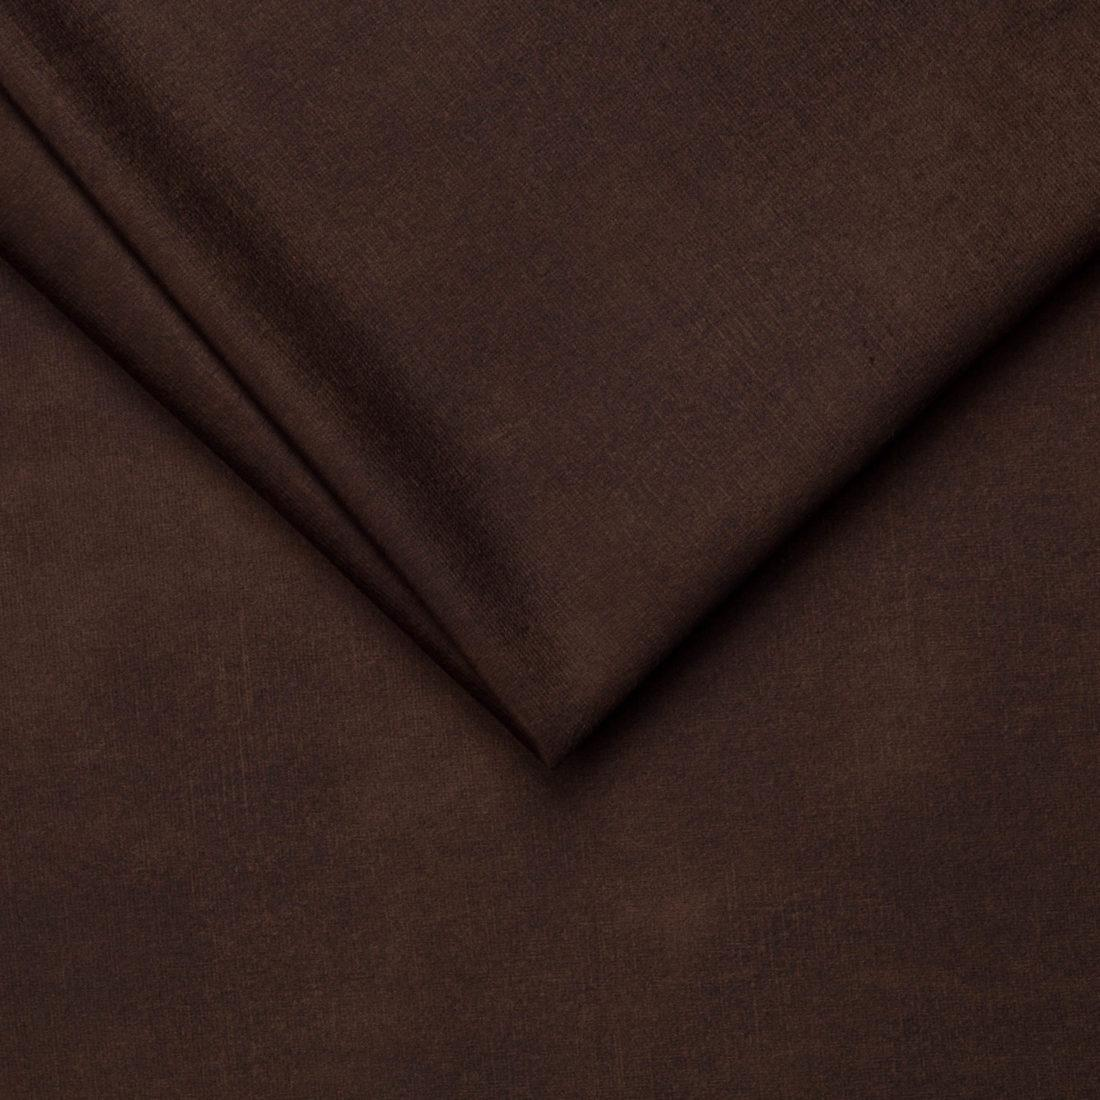 Меблева тканина Palladium 6 Chocolate, велюр